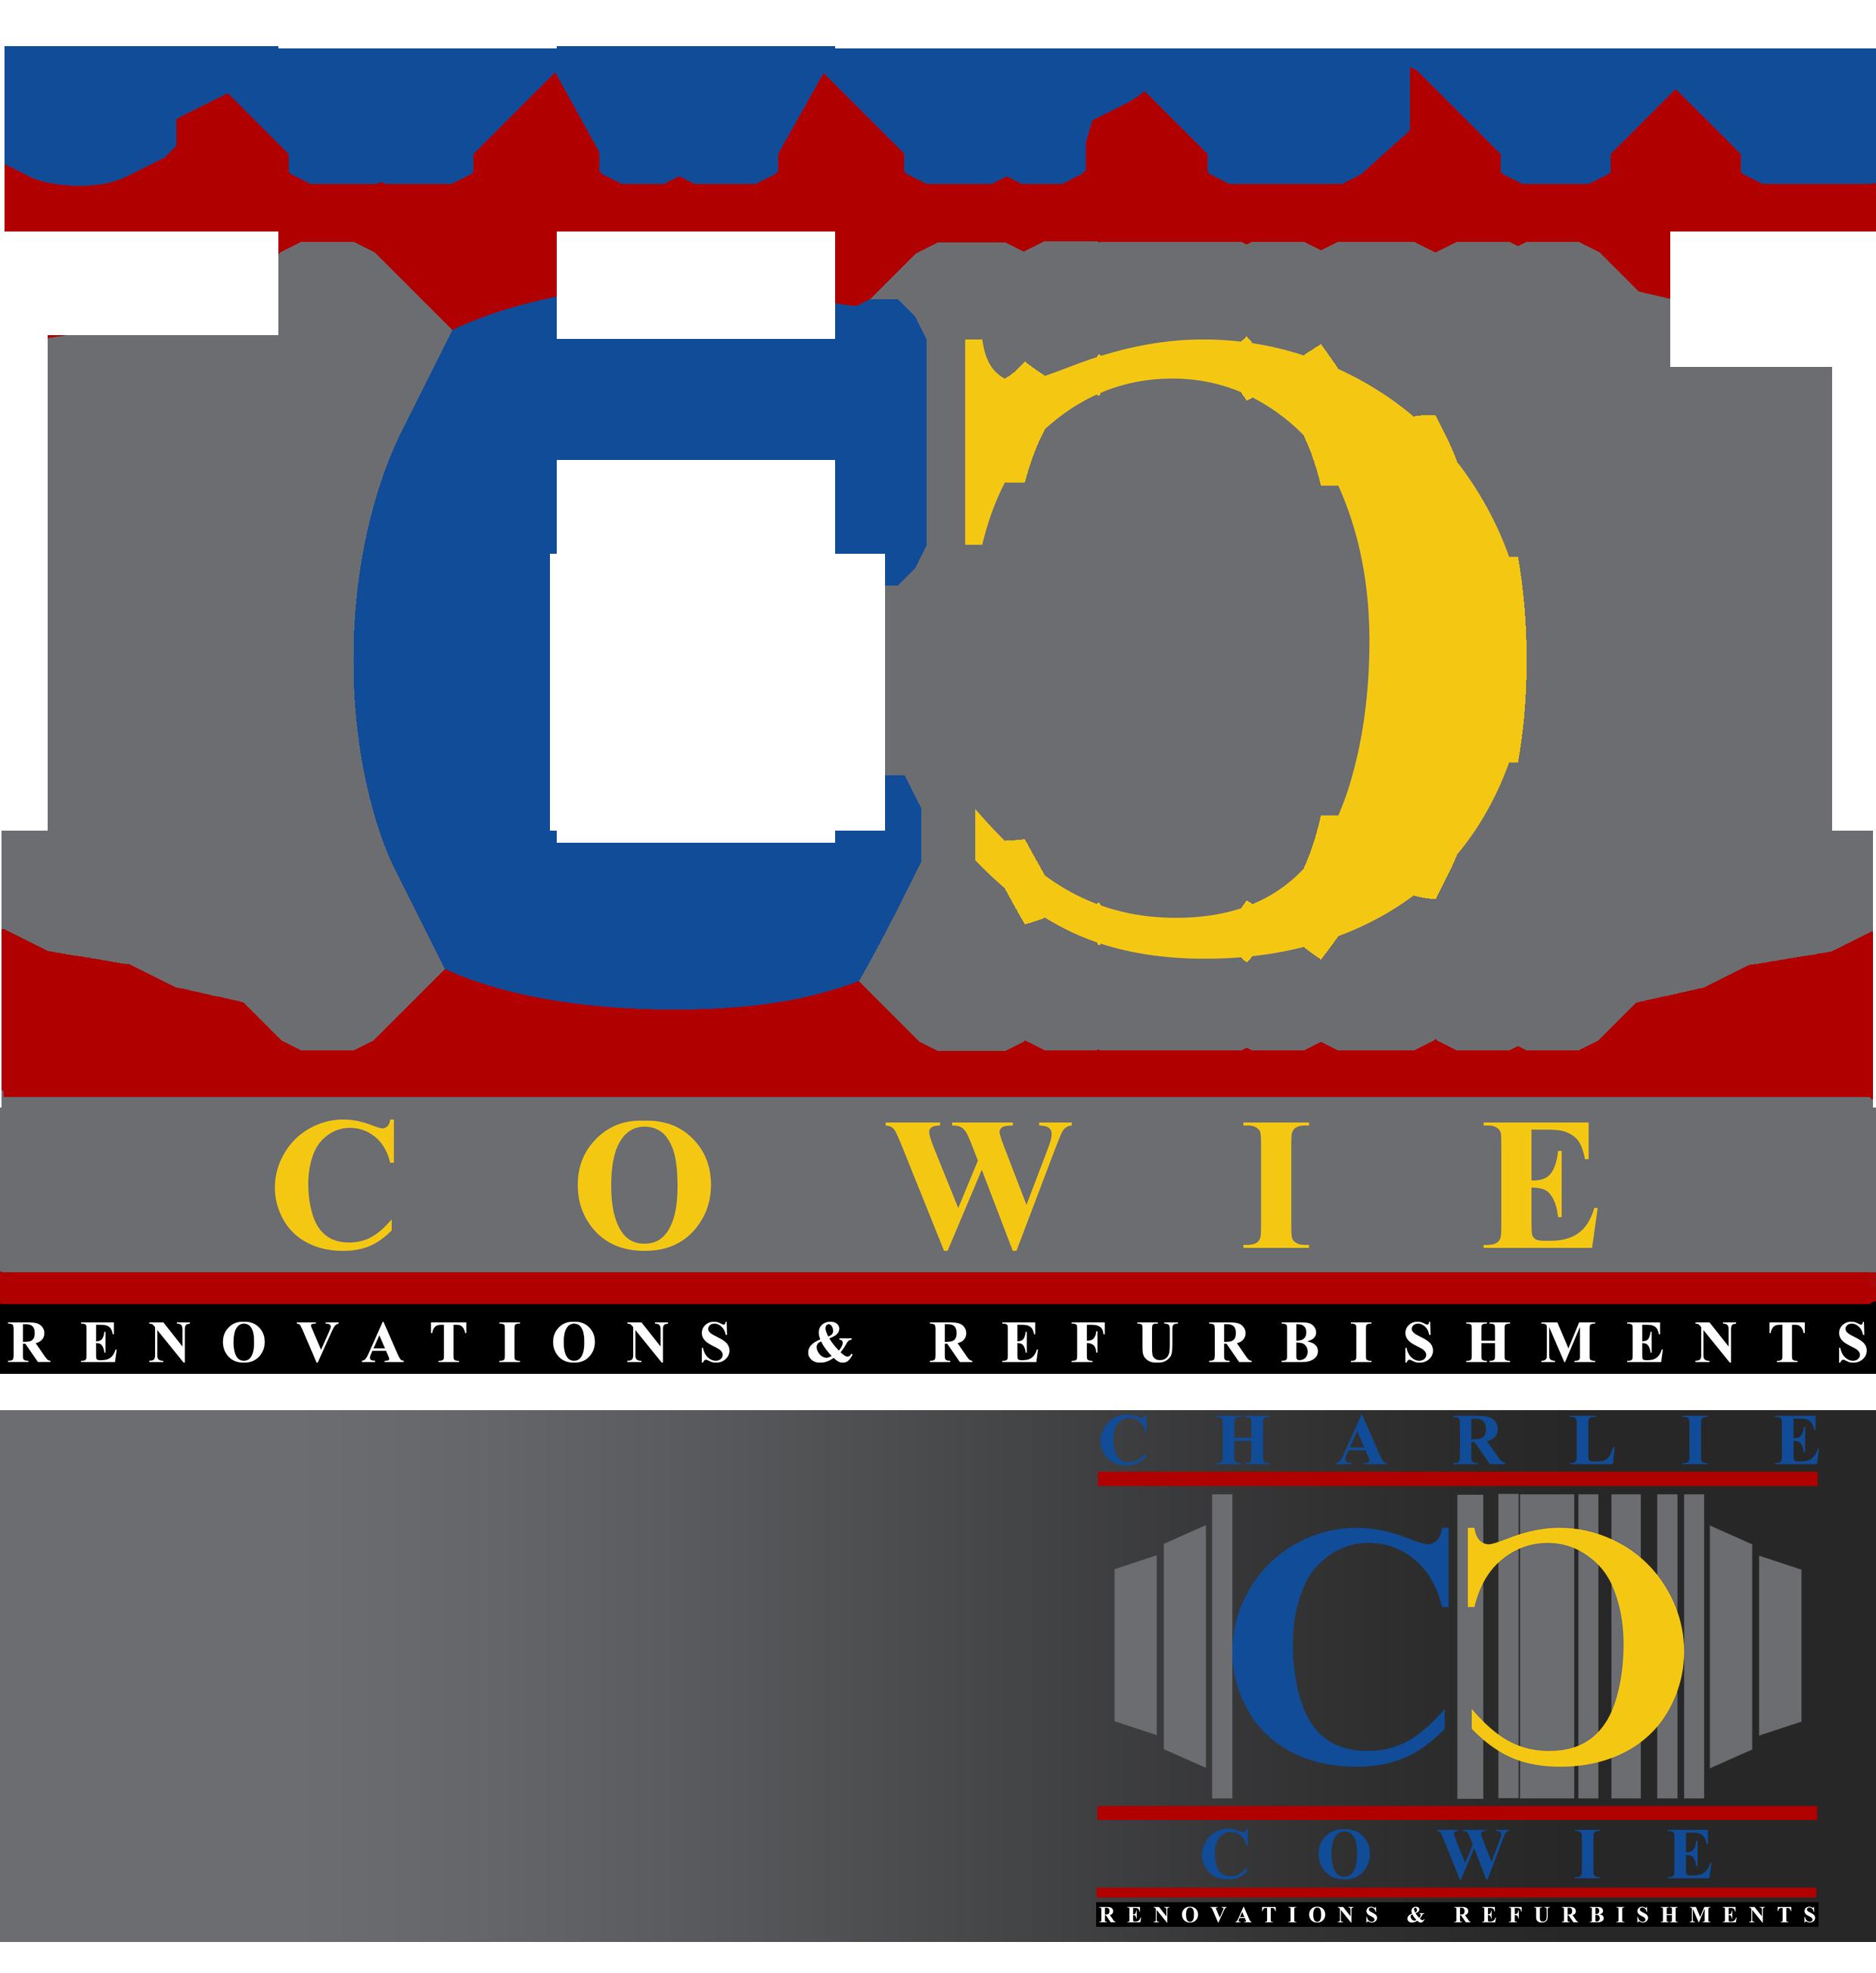 Logo Design by kree-eyt - Entry No. 71 in the Logo Design Contest Charlie Cowie Renovations & Refurbishments Logo Design.